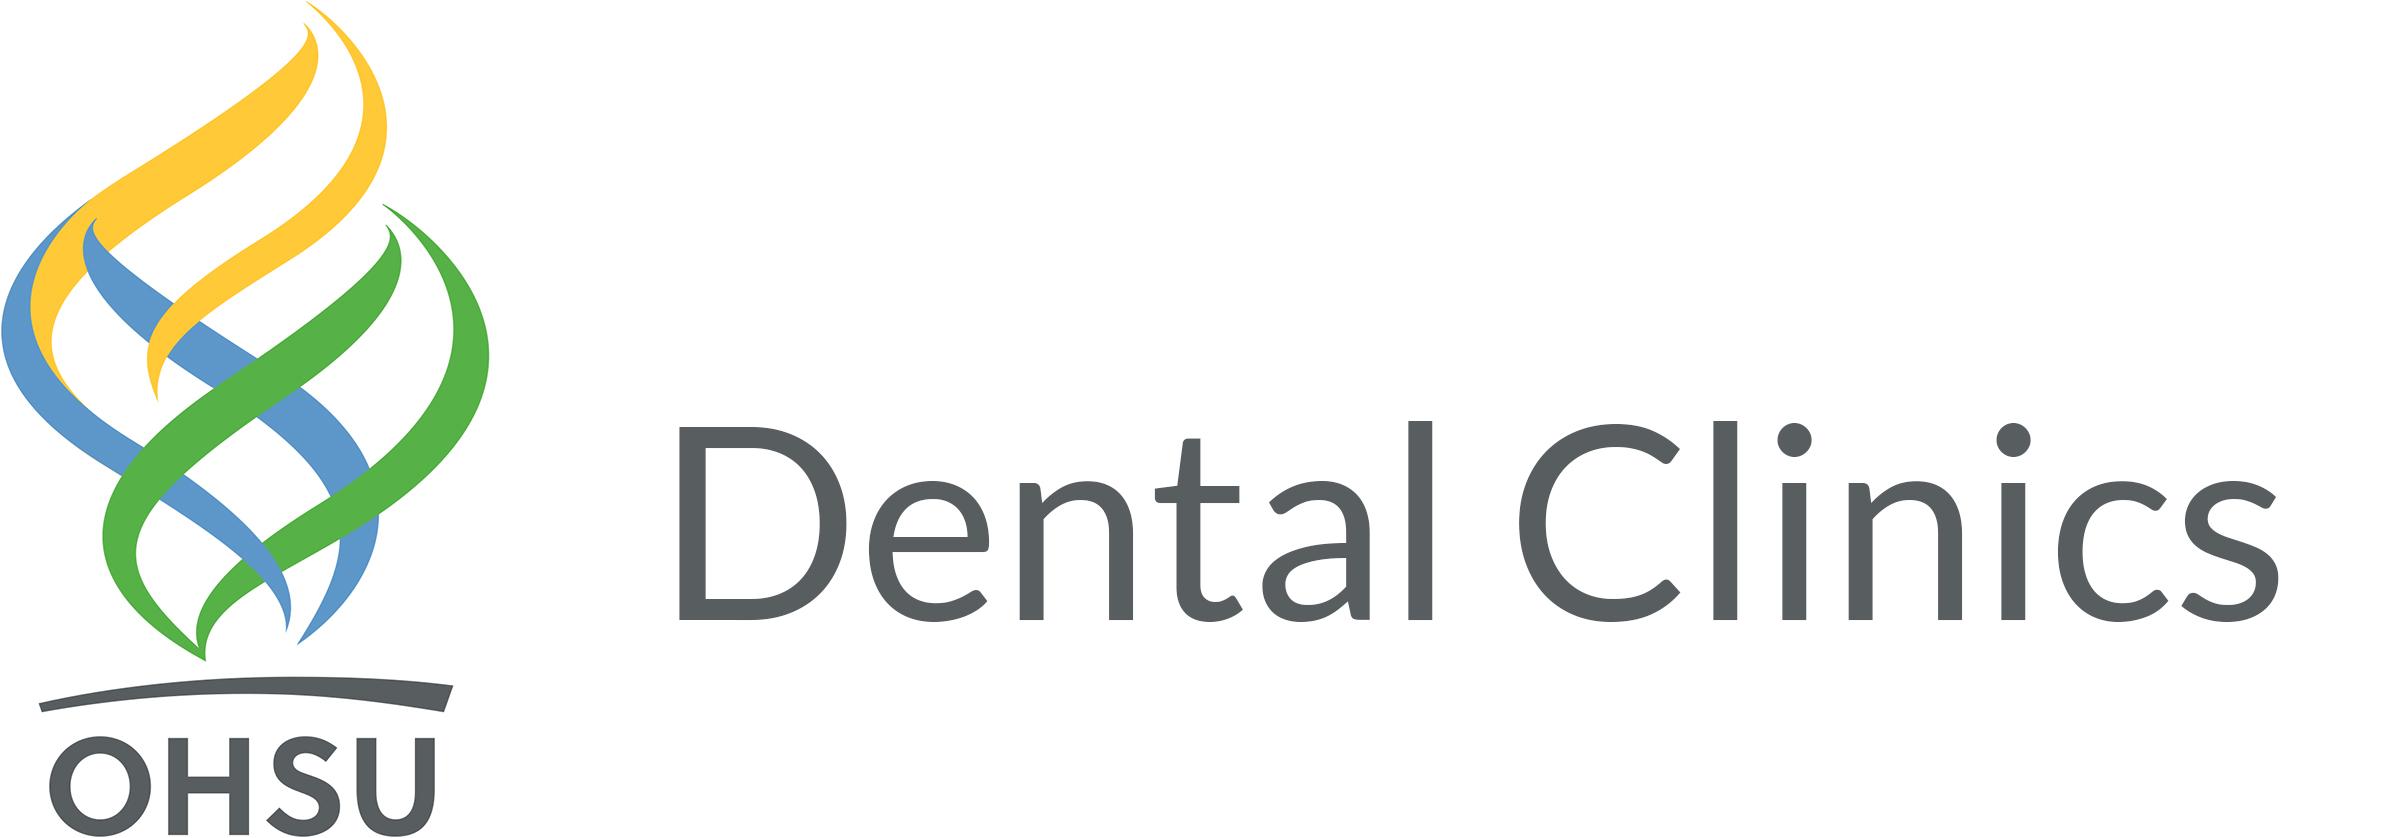 OHSU School of Dentistry | 503-494-8867